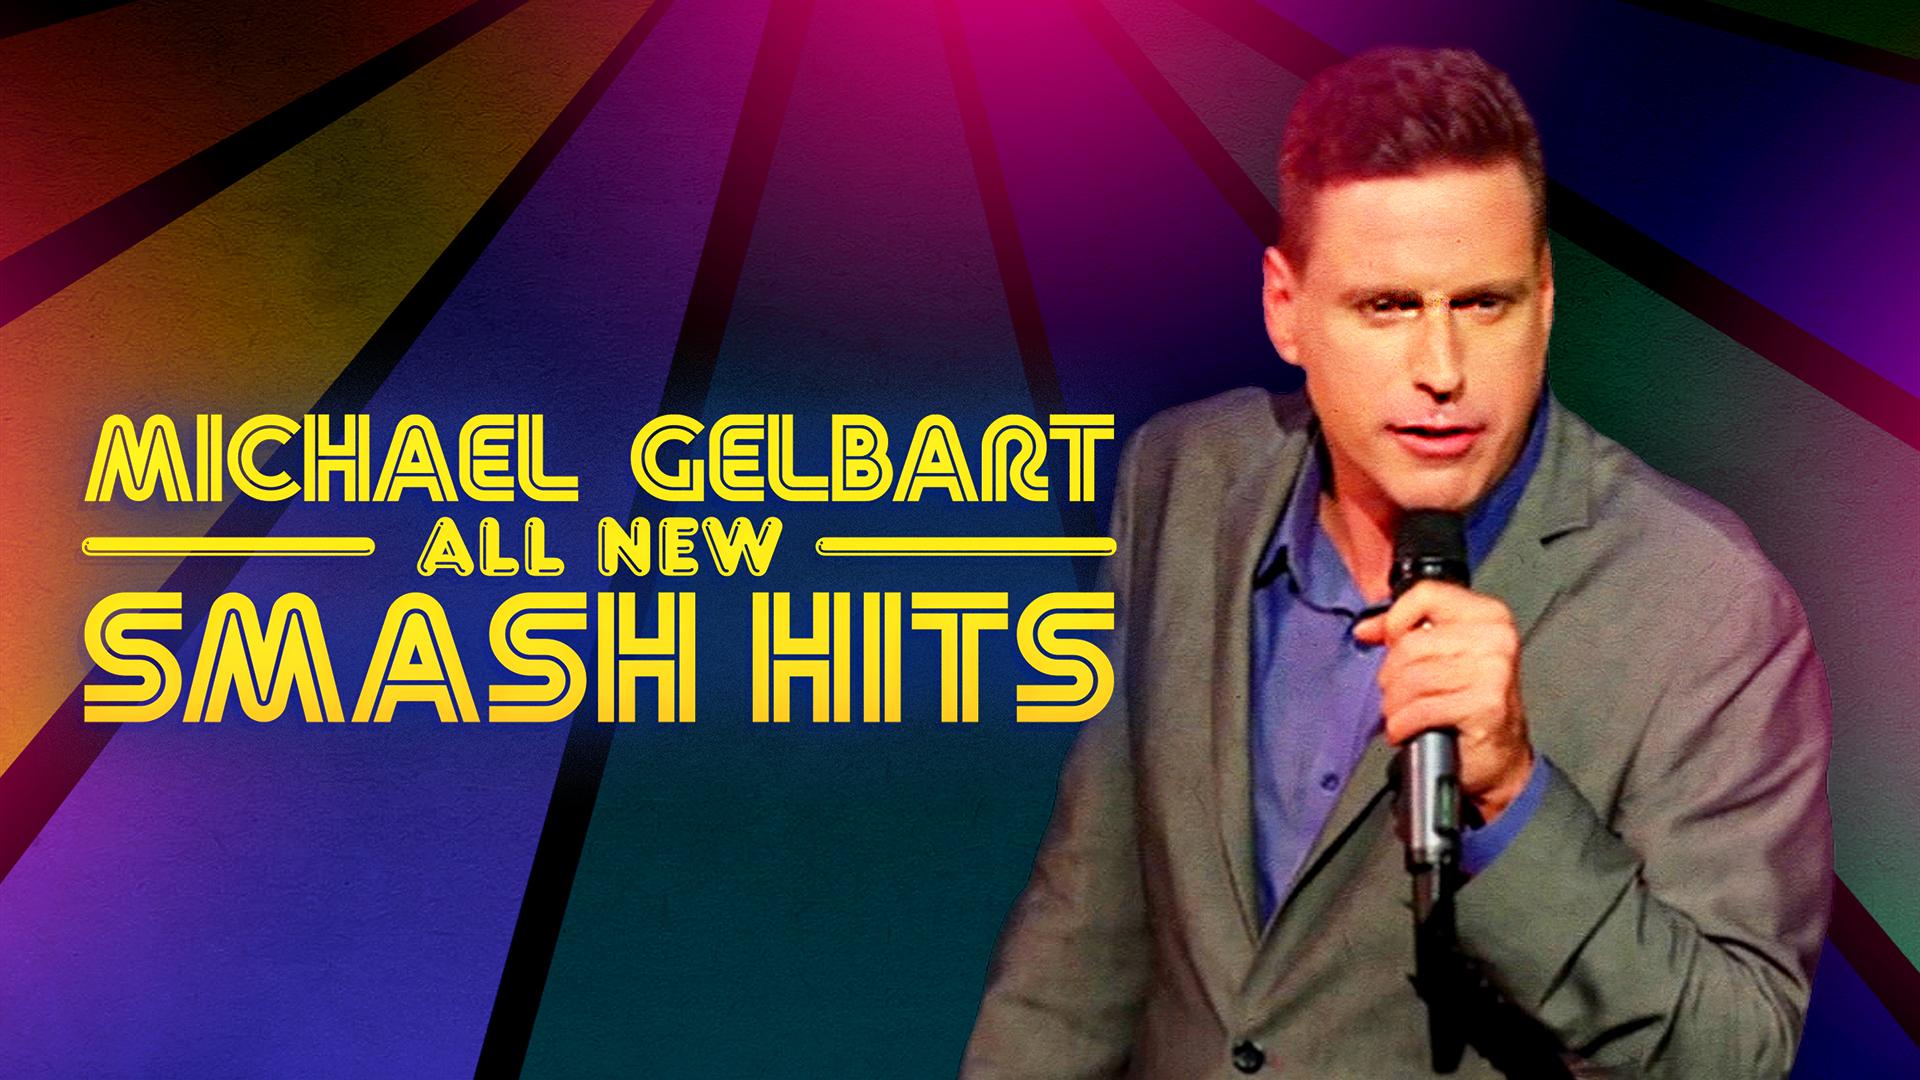 Michael Gelbart: All New Smash Hits